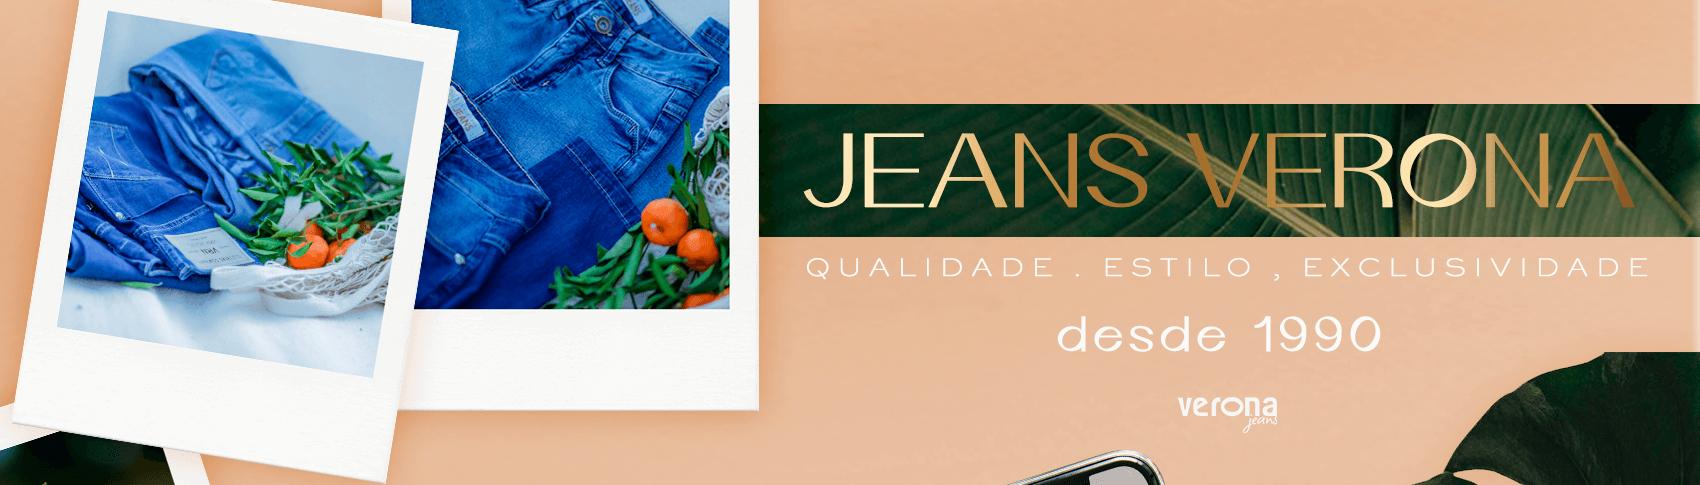 jeans verona